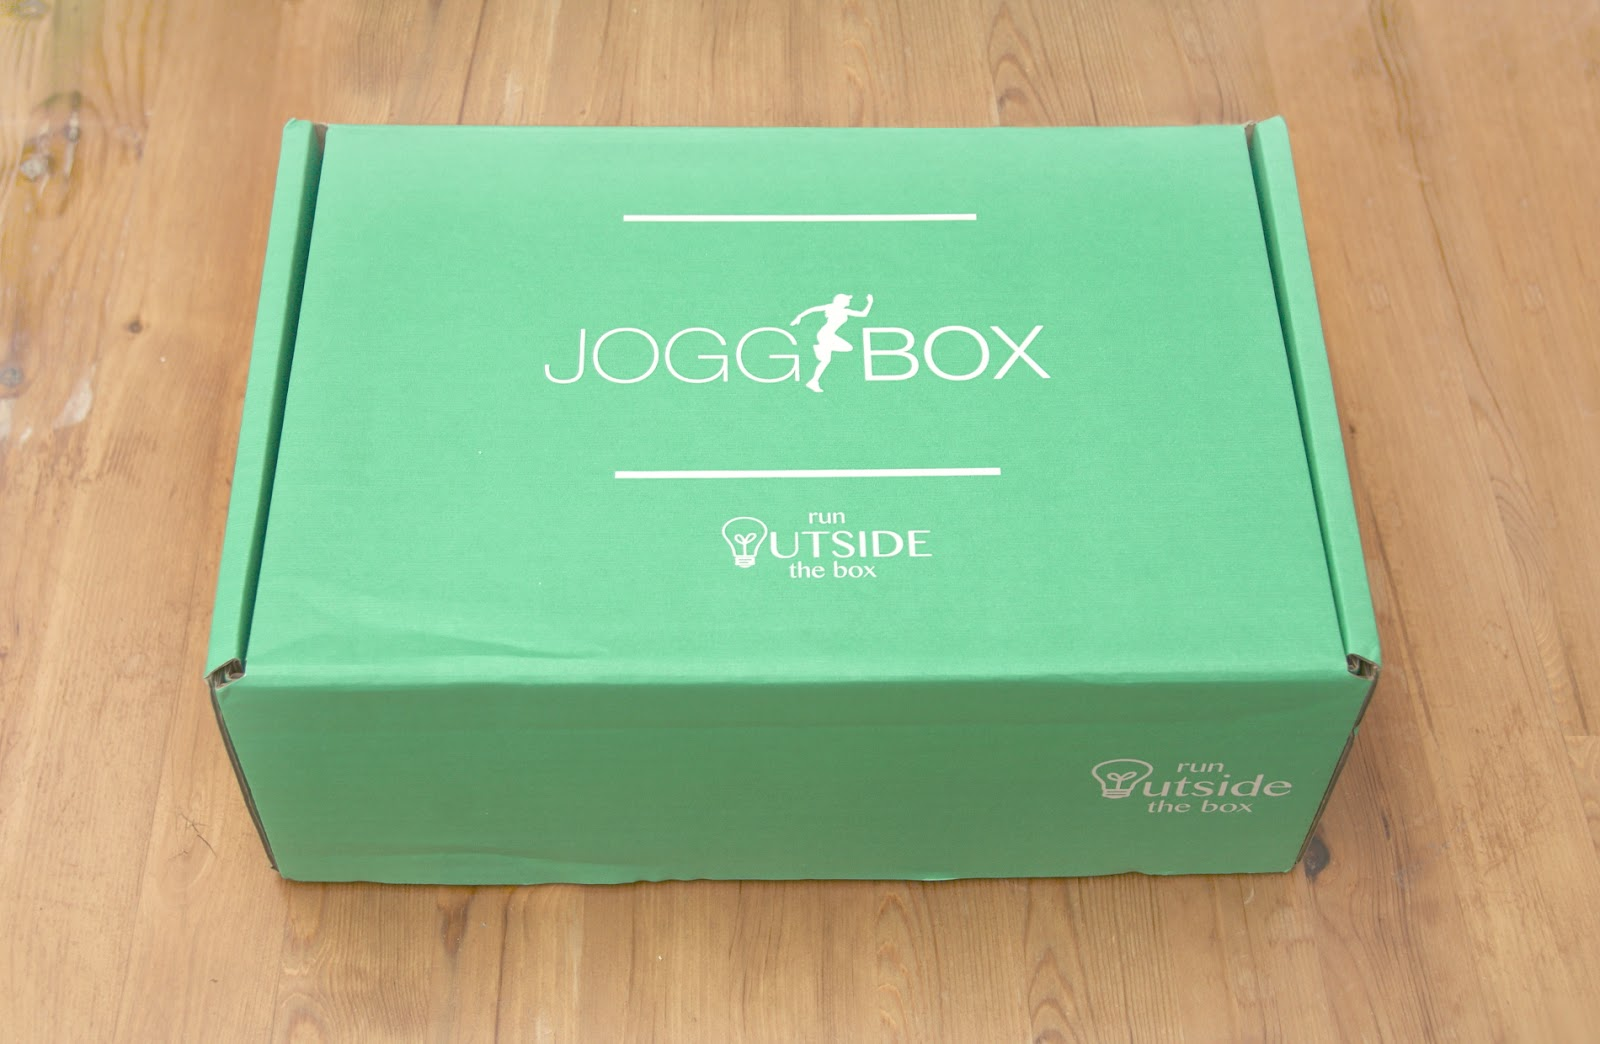 Joggbox Fitness Subscription Box Review A Blackbird S Epiphany Uk Women And Fantasy Writing Blog